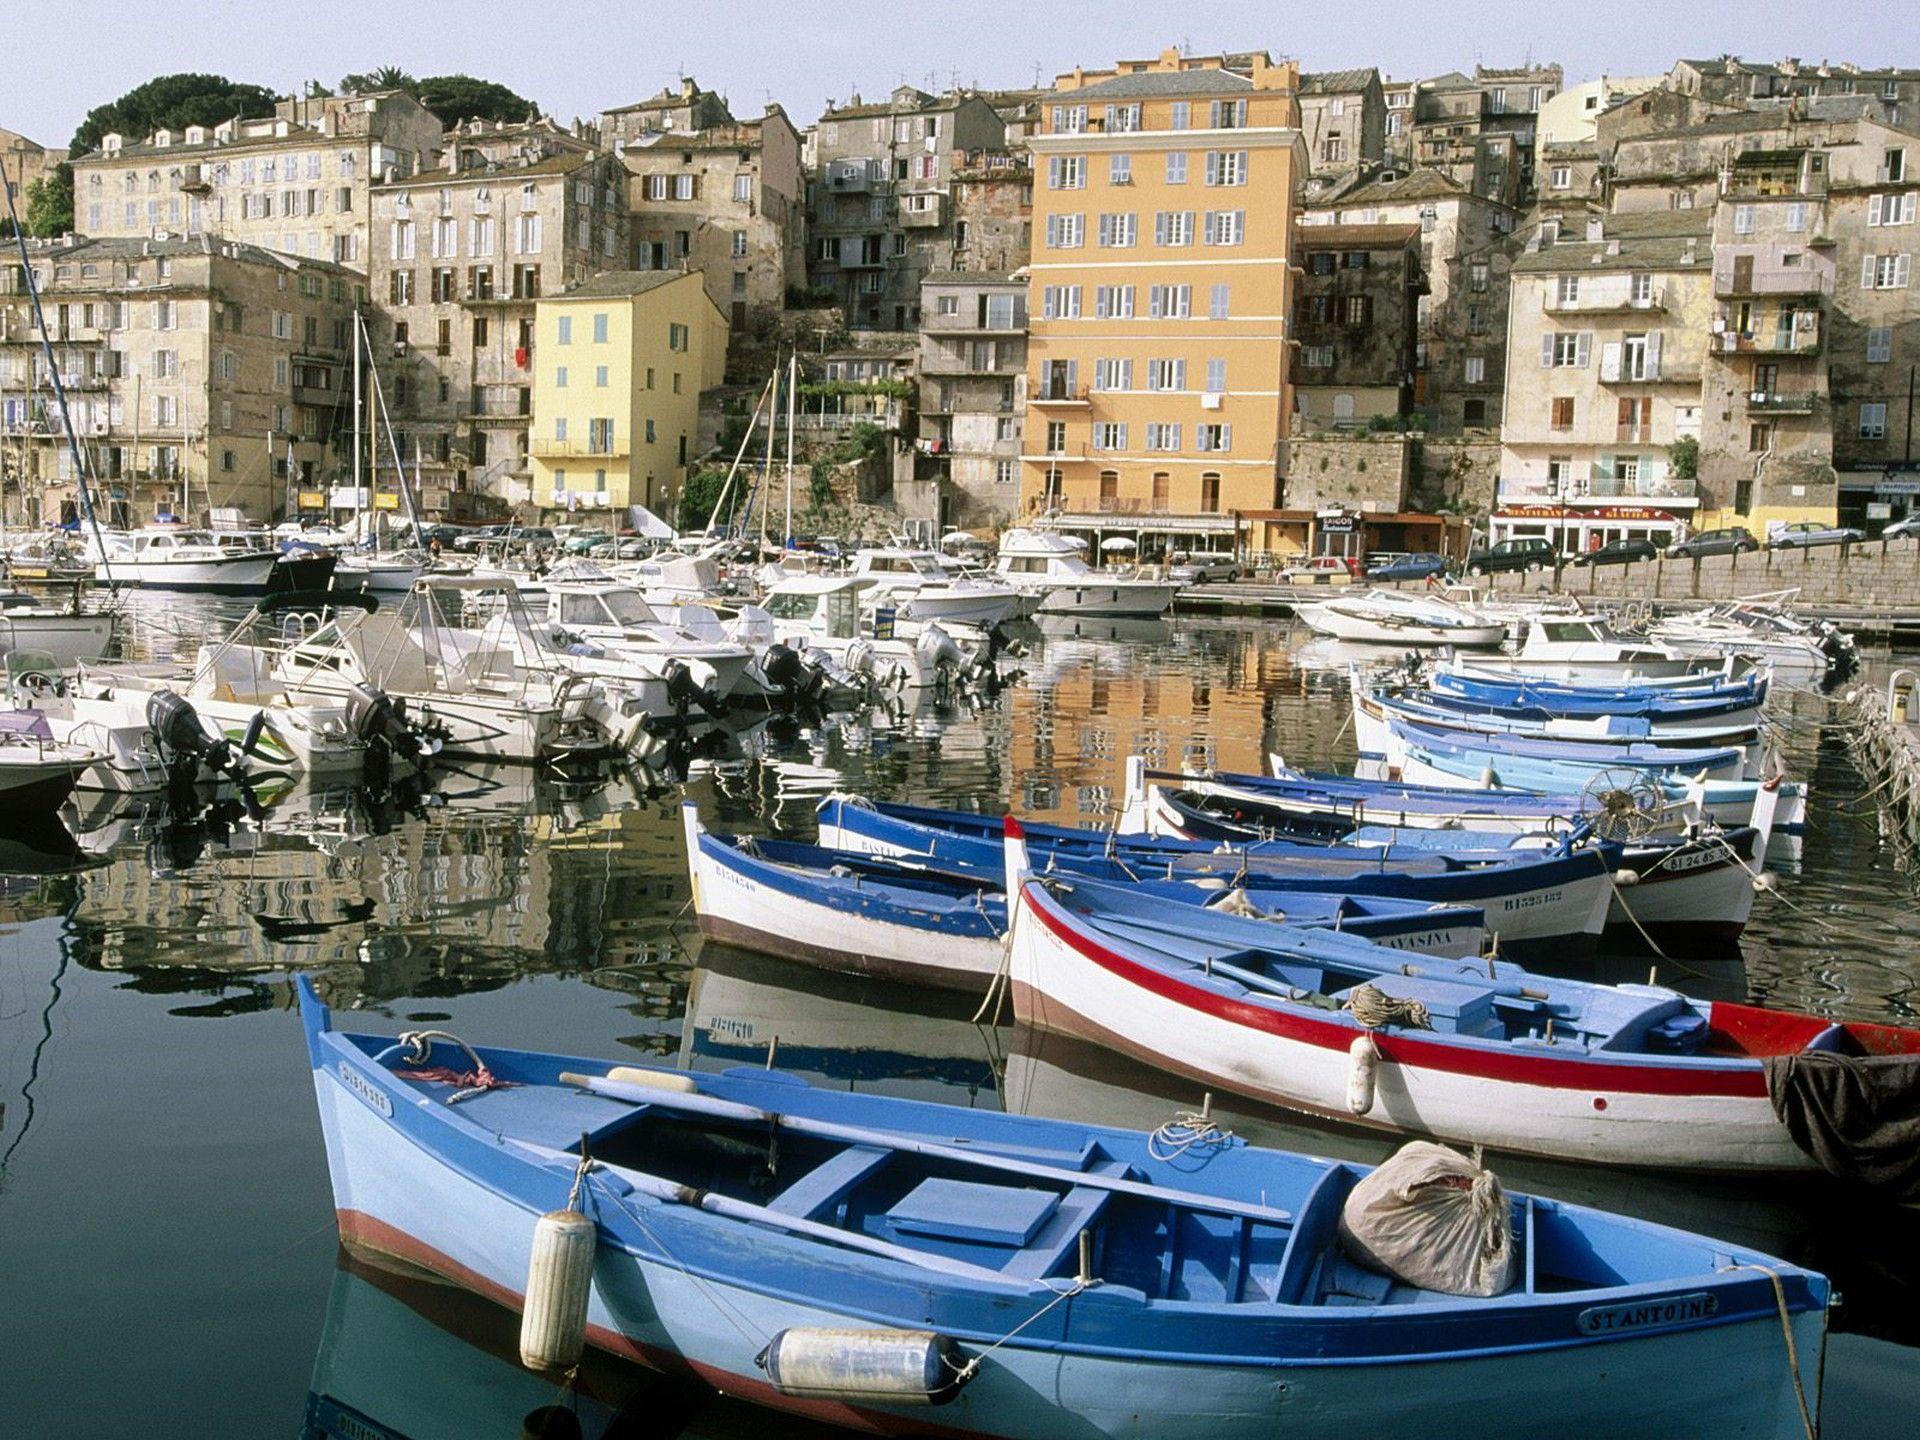 Known places Bastia Corsica France desktop wallpaper nr 34847 1920x1440